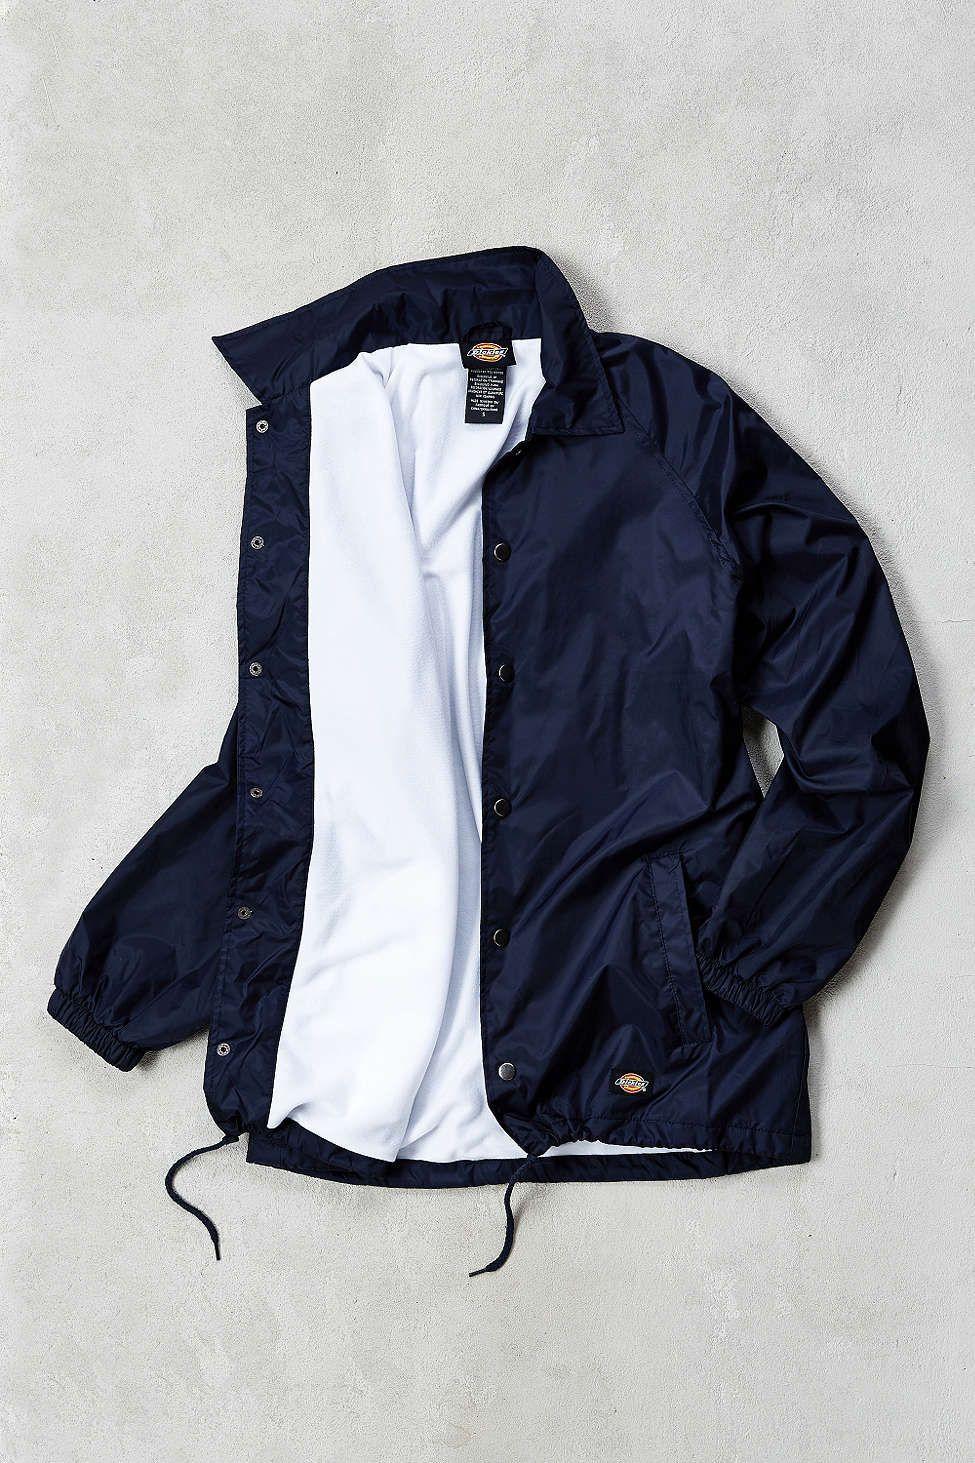 a8e51a450 Dickies Snap Front Nylon Coaches Jacket | CLOTHES | Jackets, Nike ...